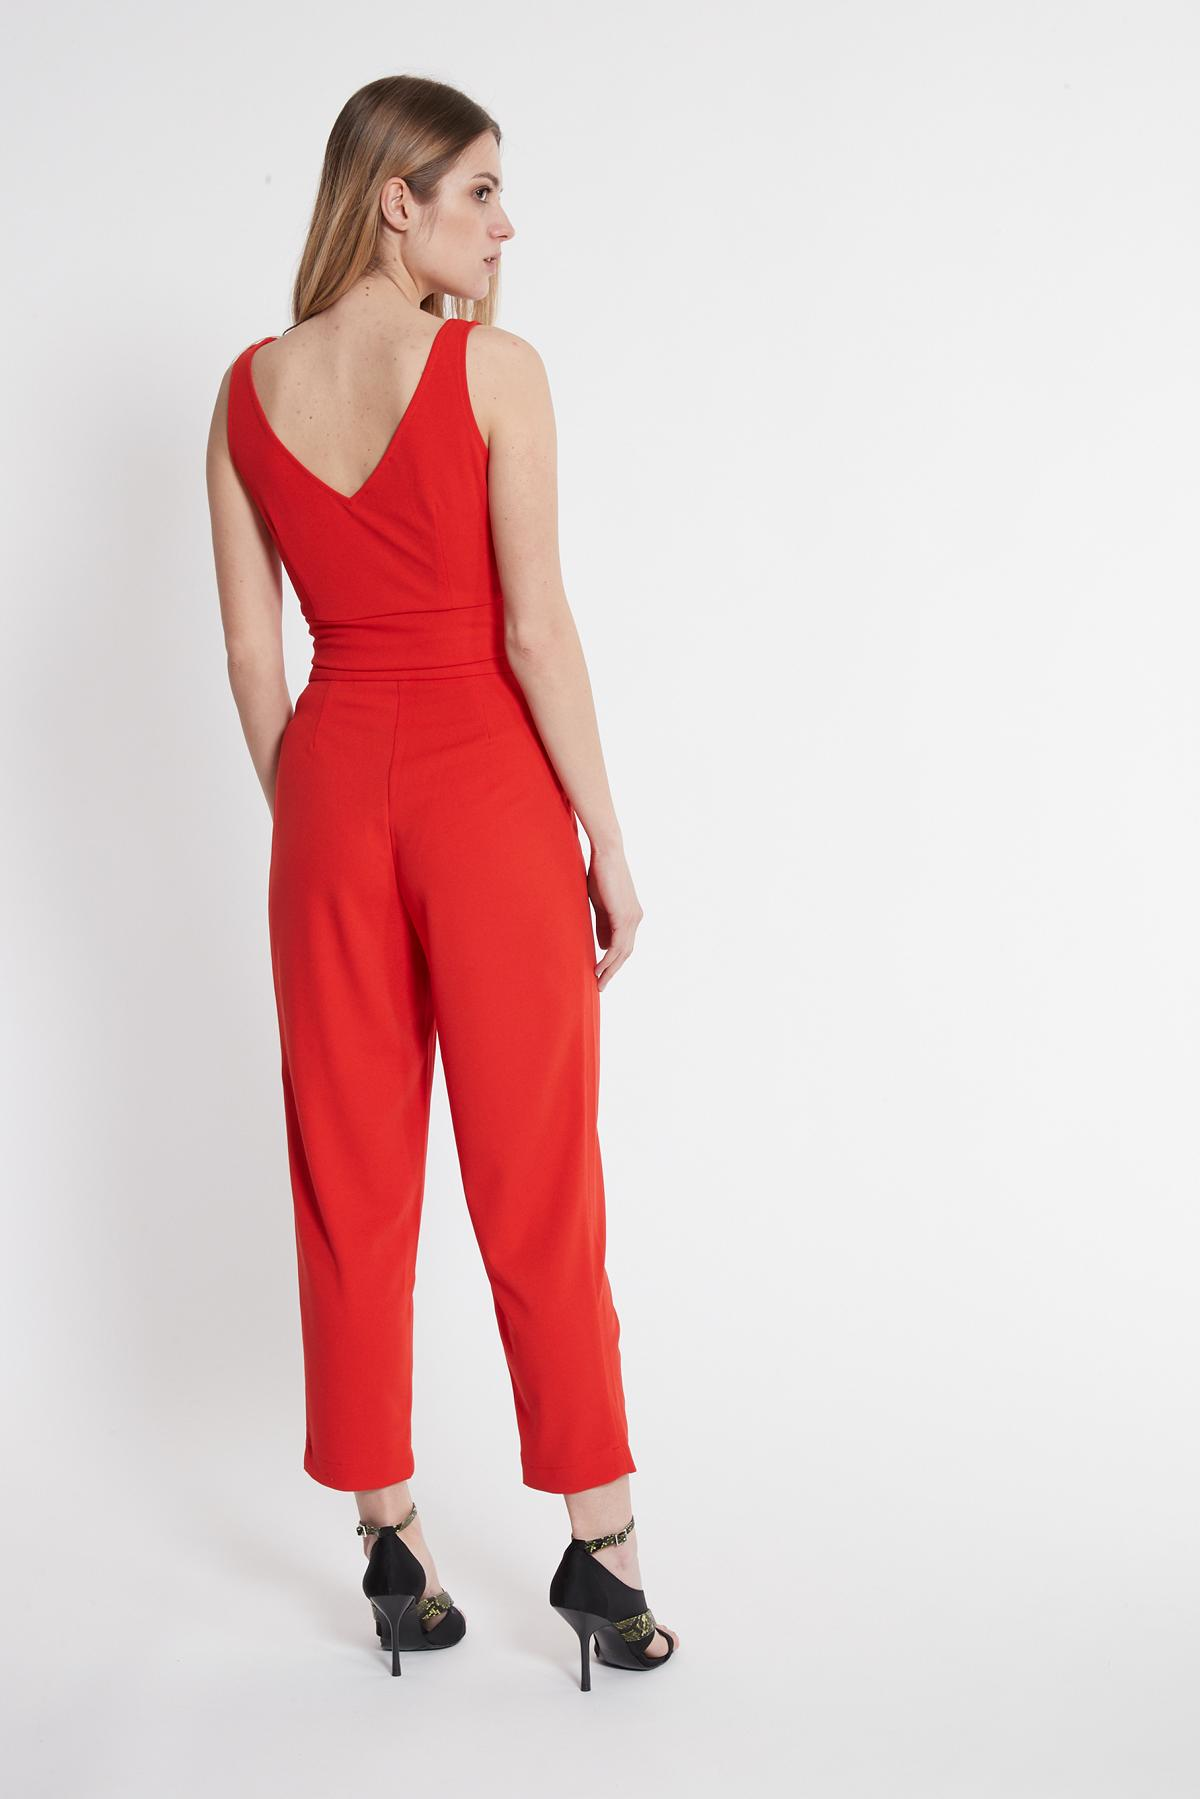 Rückansicht von Ana Alcazar V-Top Saxose Rot  angezogen an Model